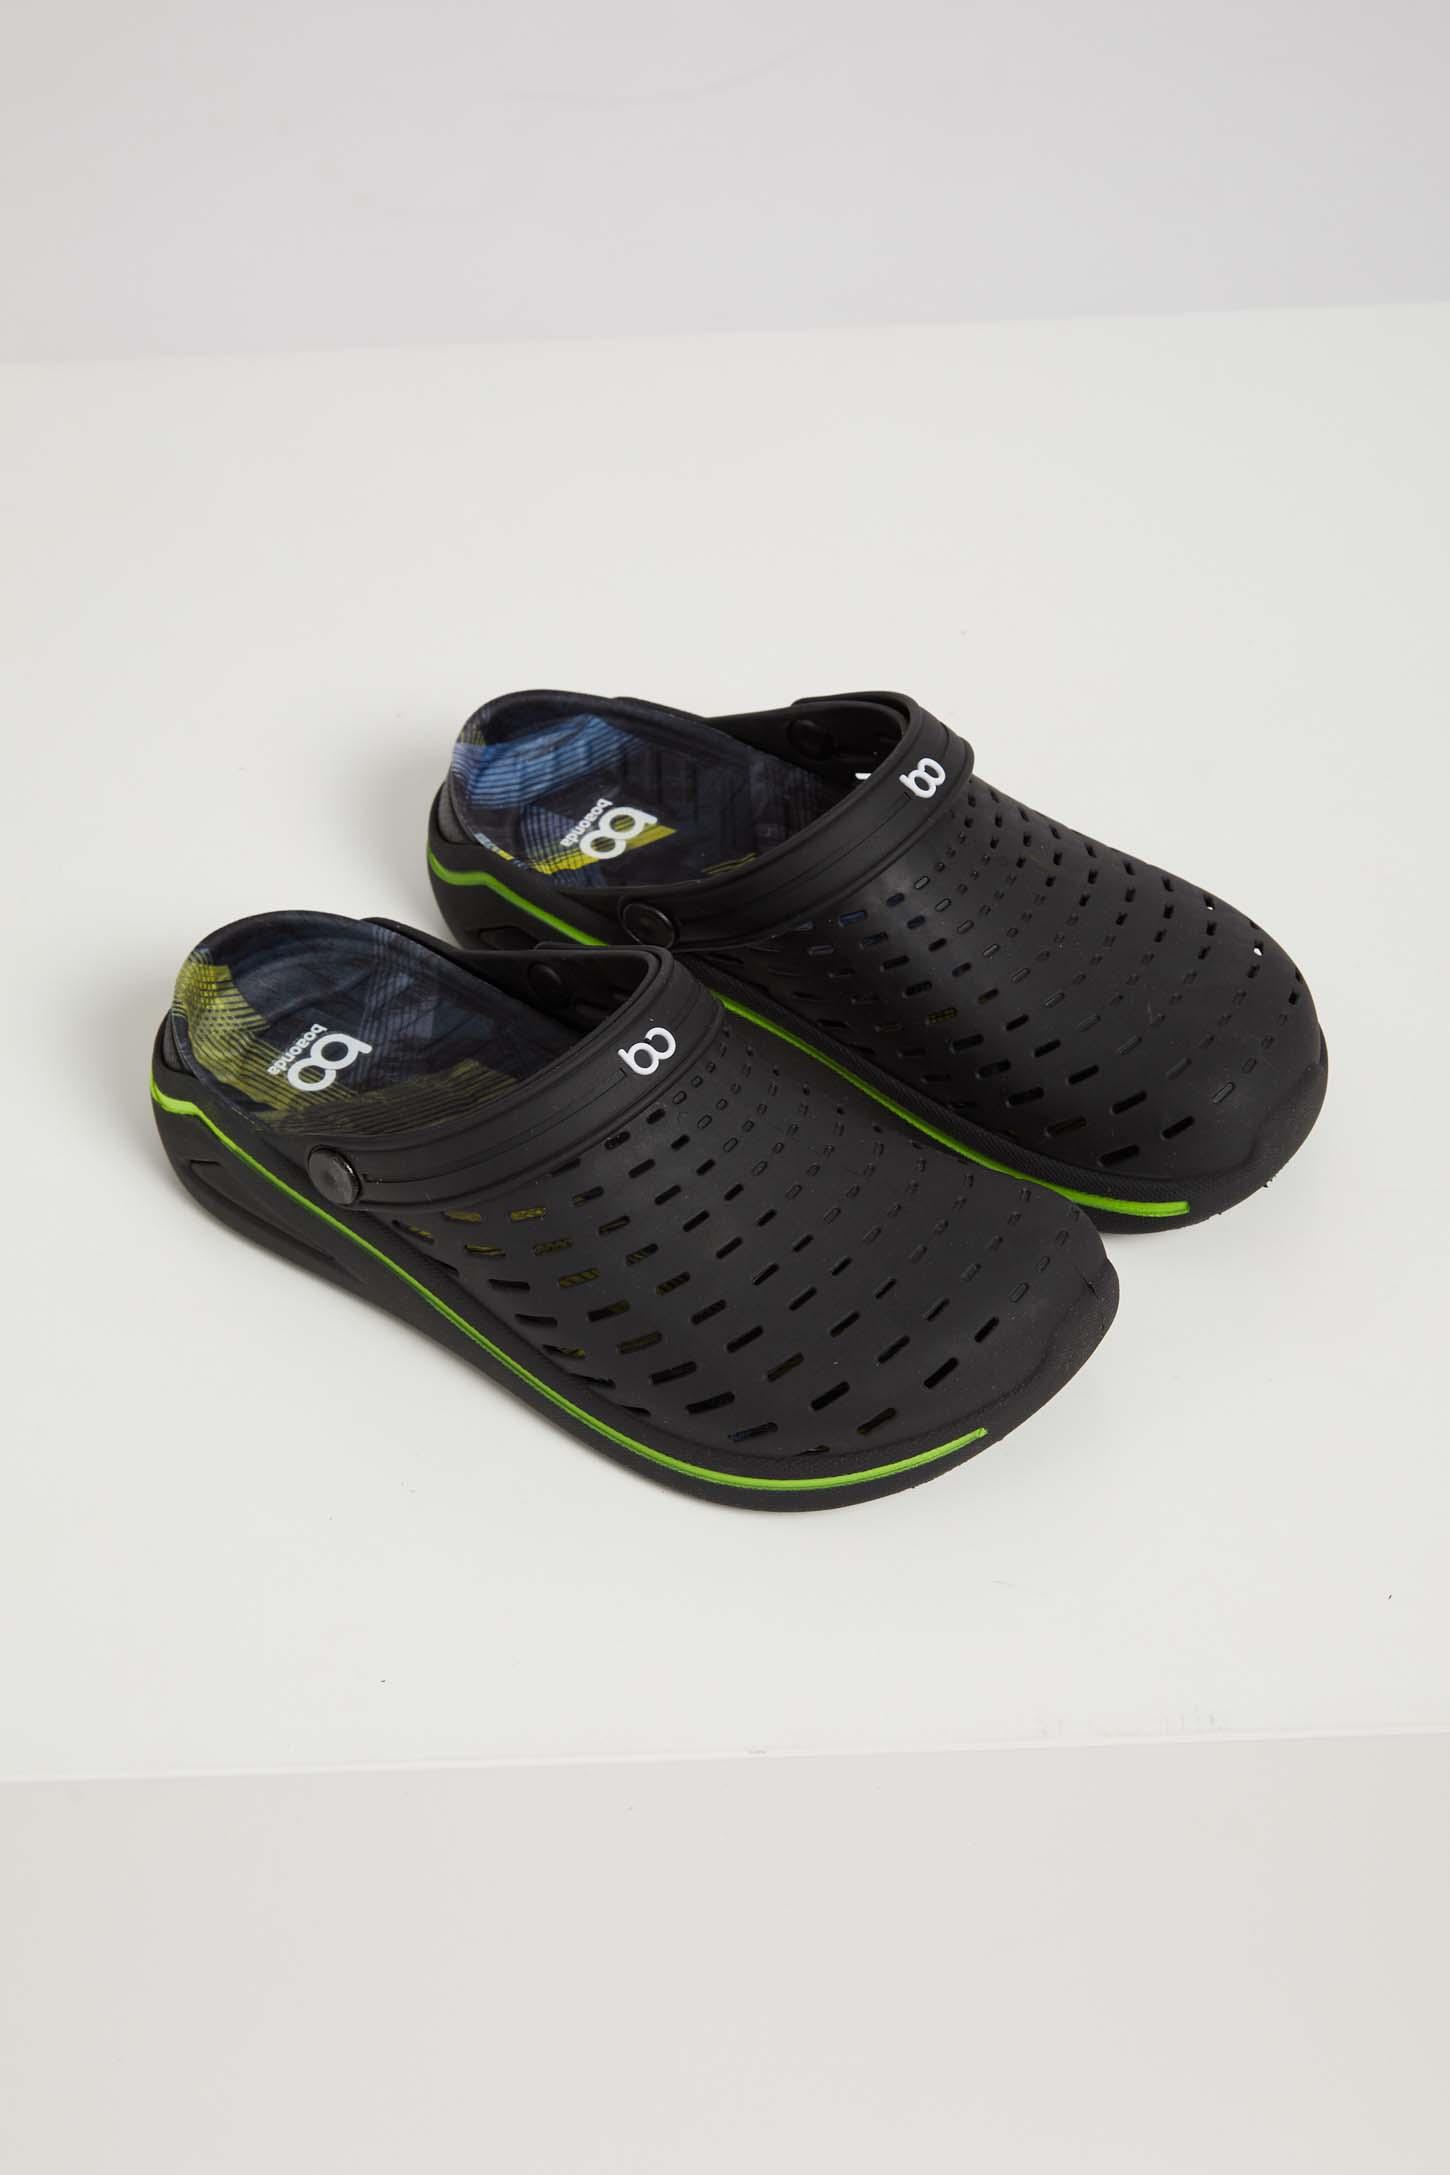 Sandalia-Crocs-Masculino-Com-Furos-Boa-Onda-Preto